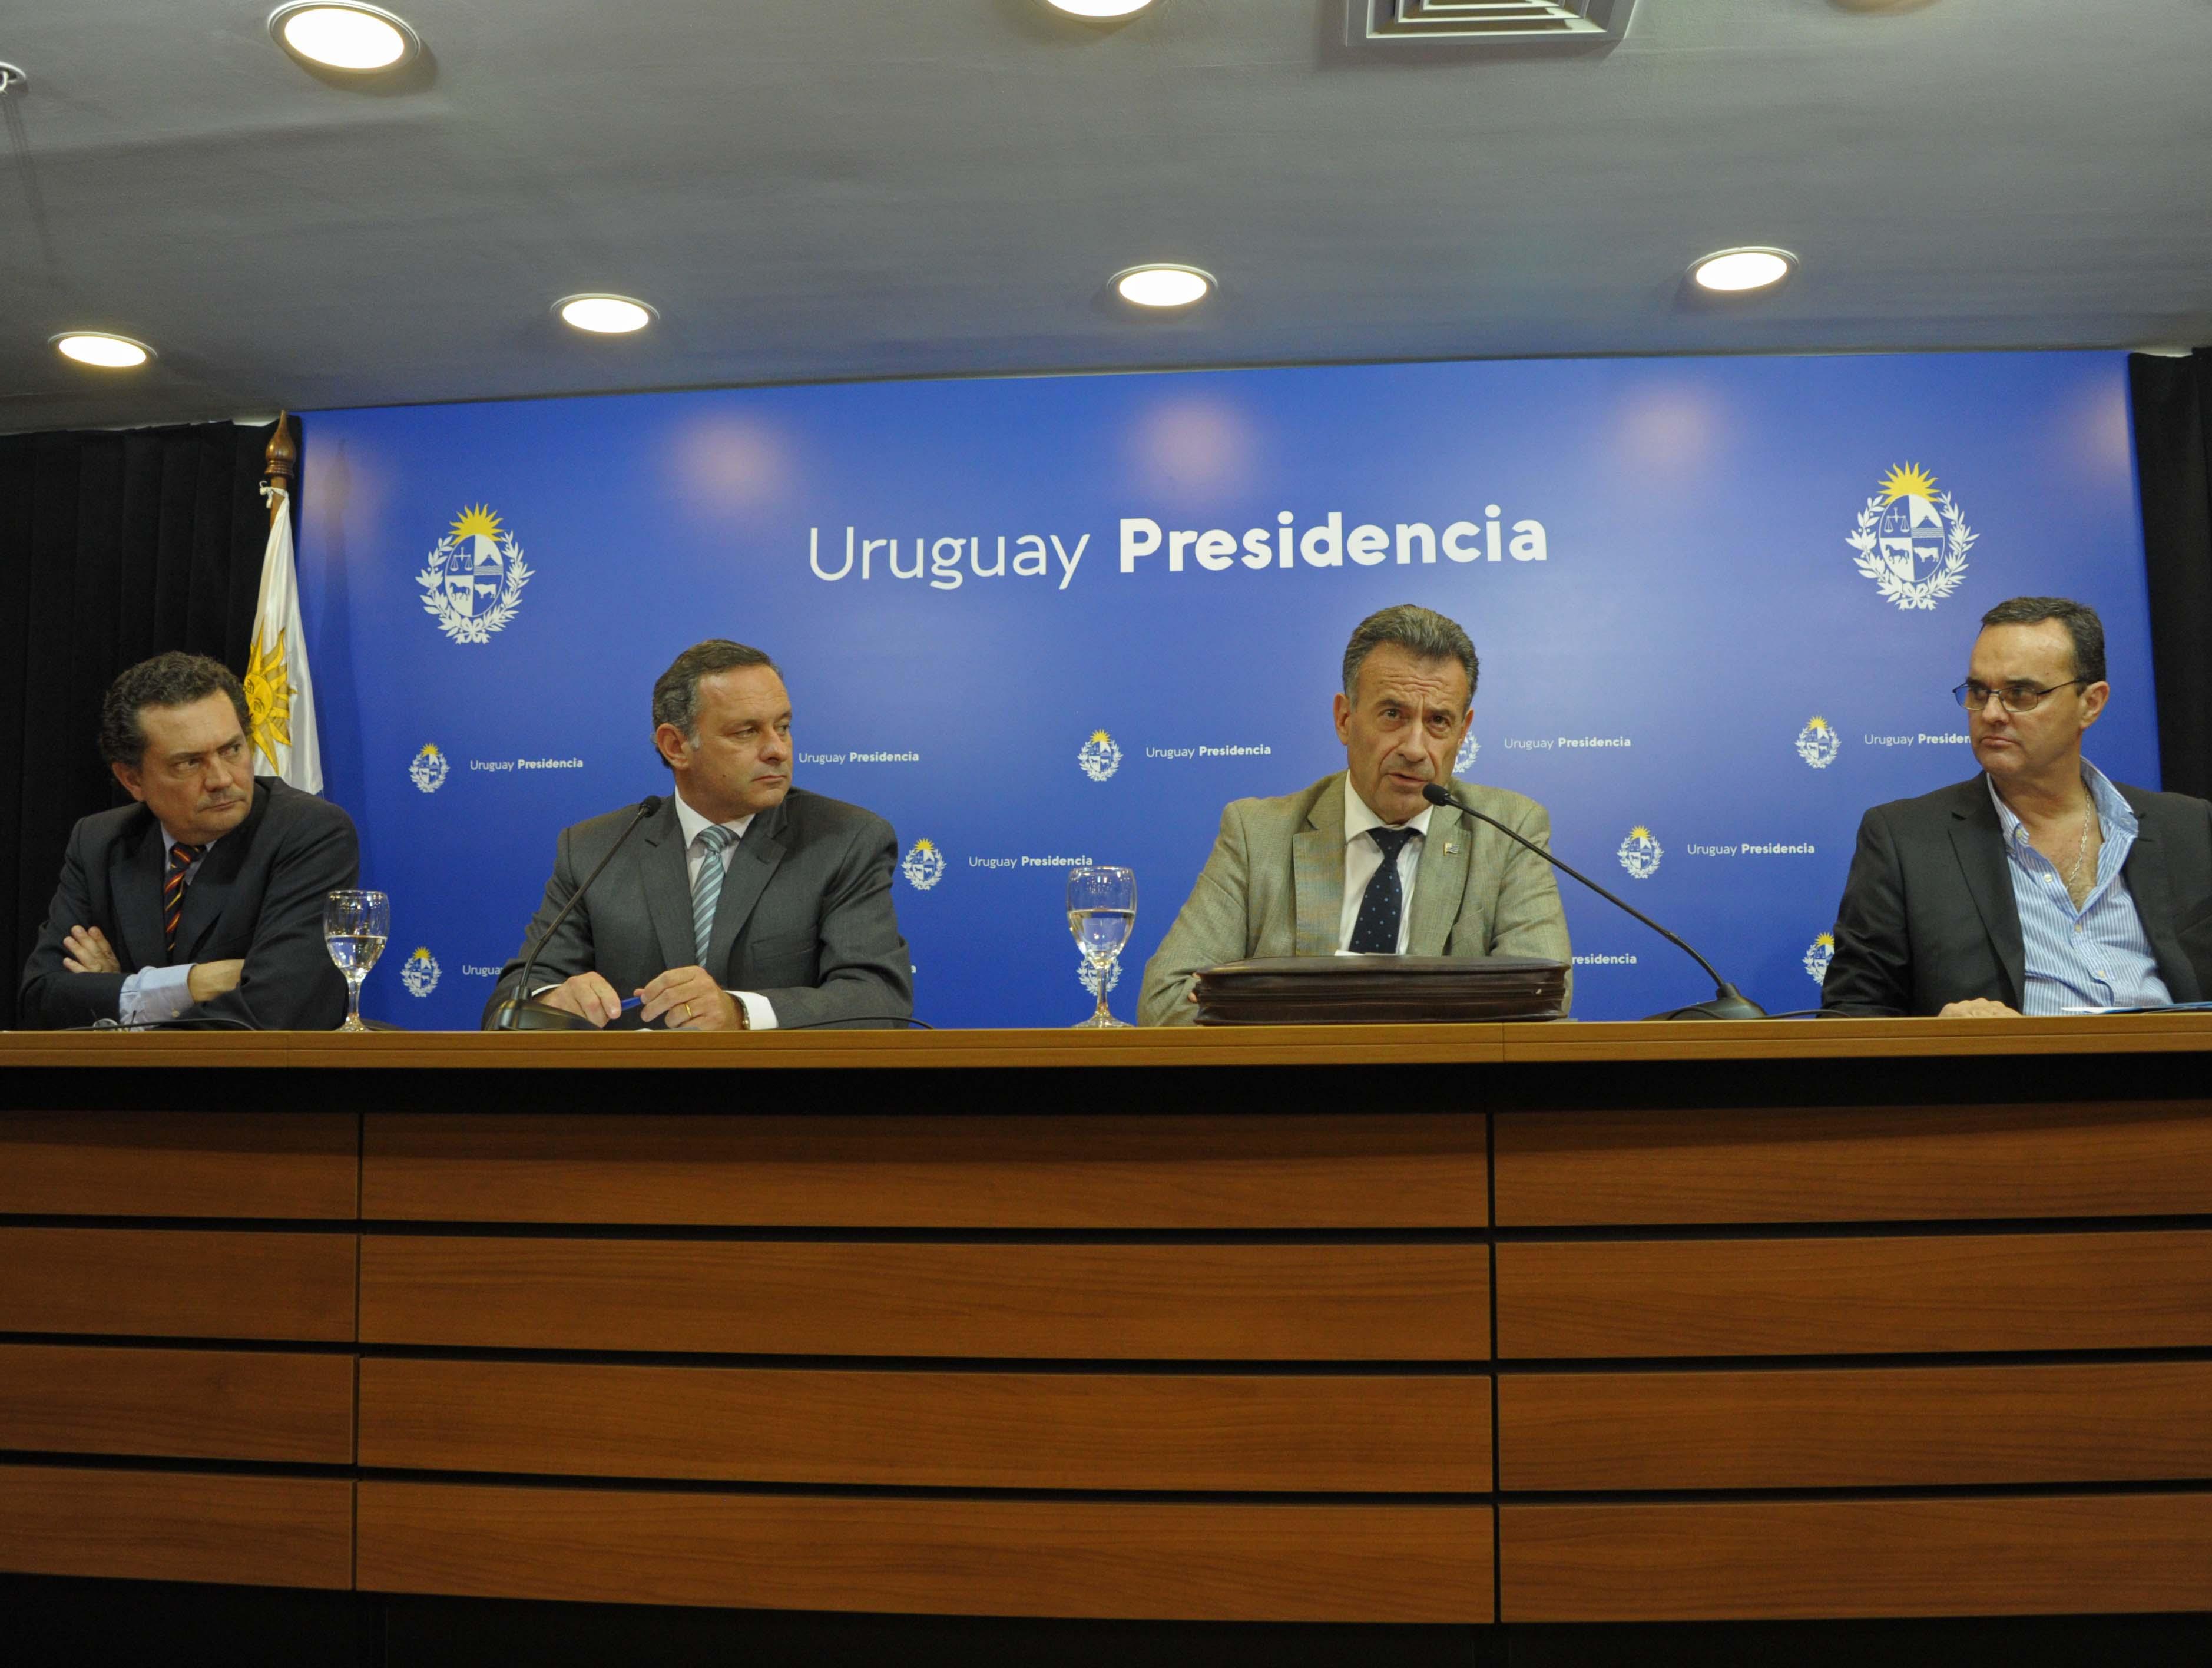 Prosecretario de Presidencia, Rodrigo Ferrés, secretario de Presidencia, Álvaro Delgado, ministro Daniel Salinas y ministro Pablo Bartol